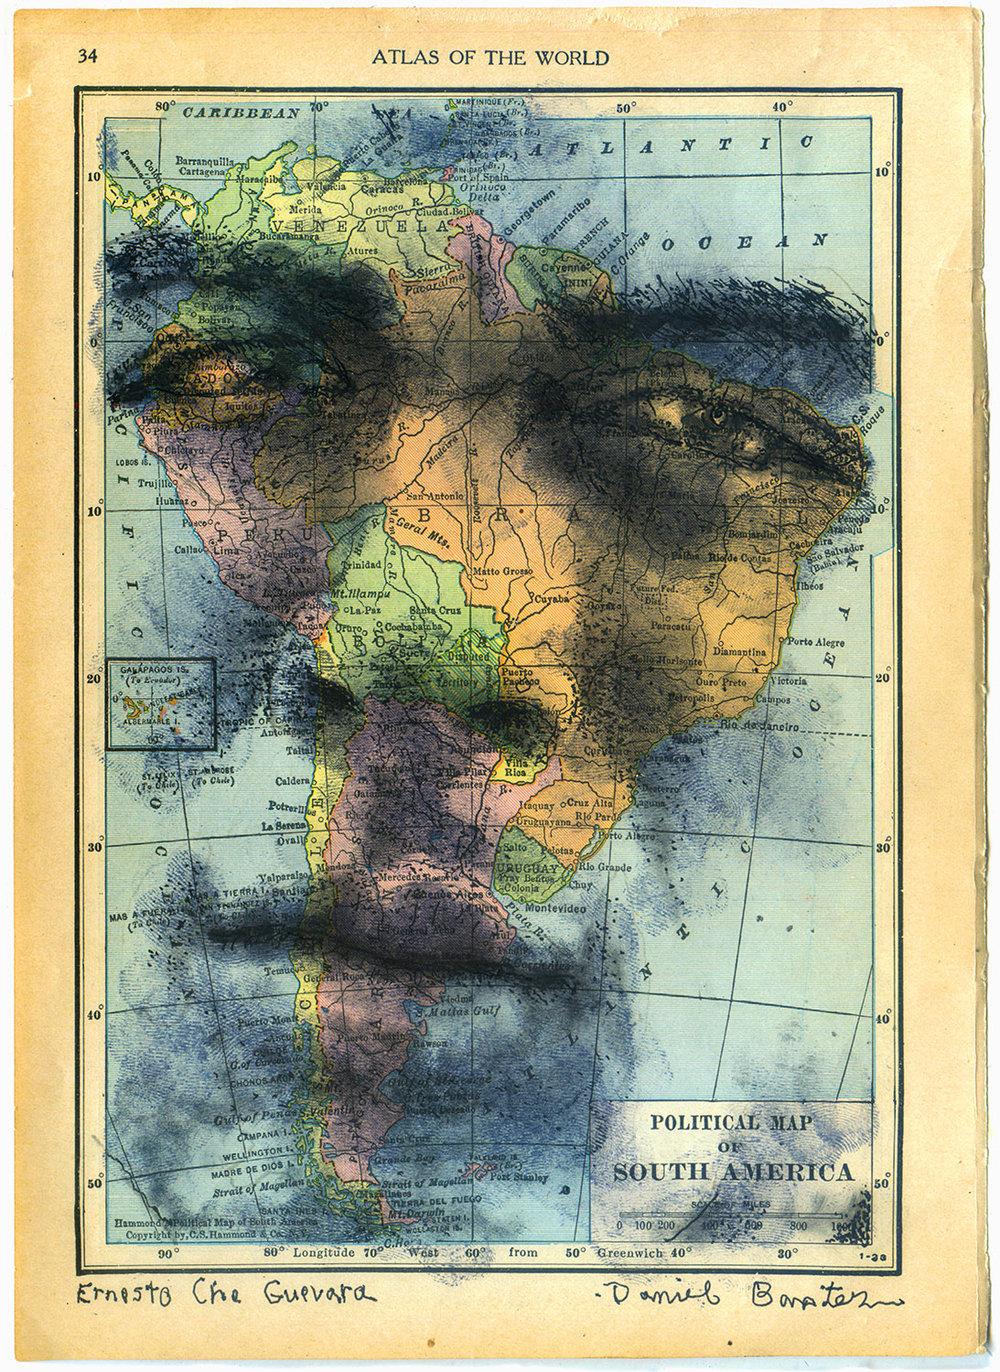 Daniel Baxter Ernesto Che Guevara portrait.jpg